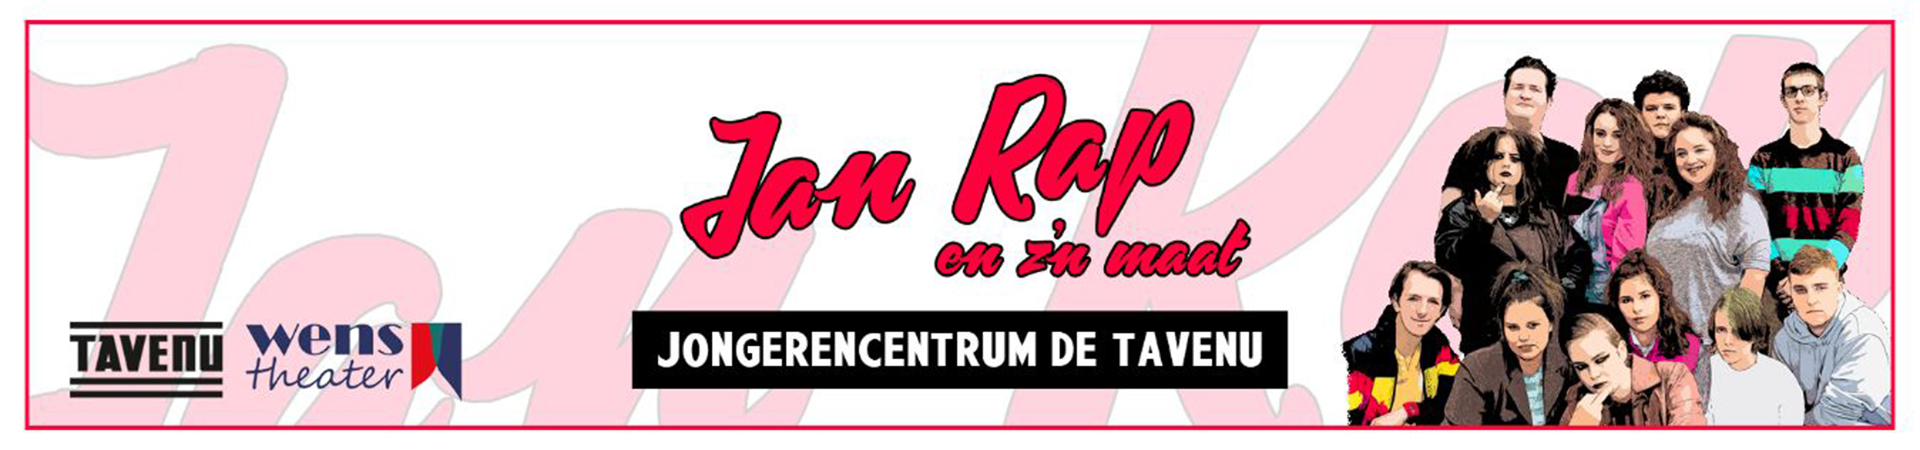 Tavenu - Jap Rap en zn maat